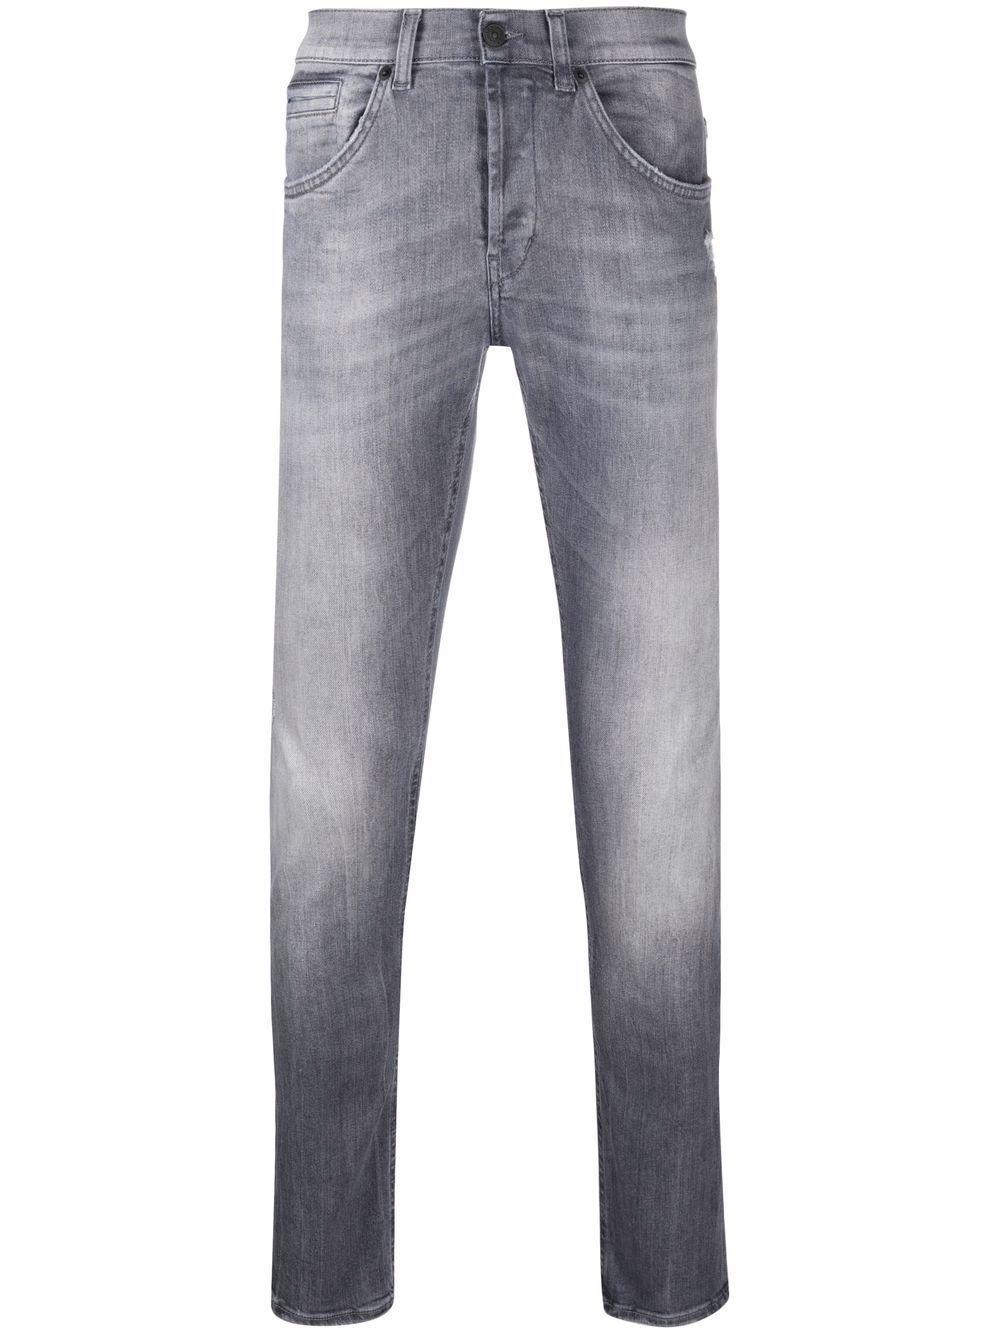 Dondup jeans grigio